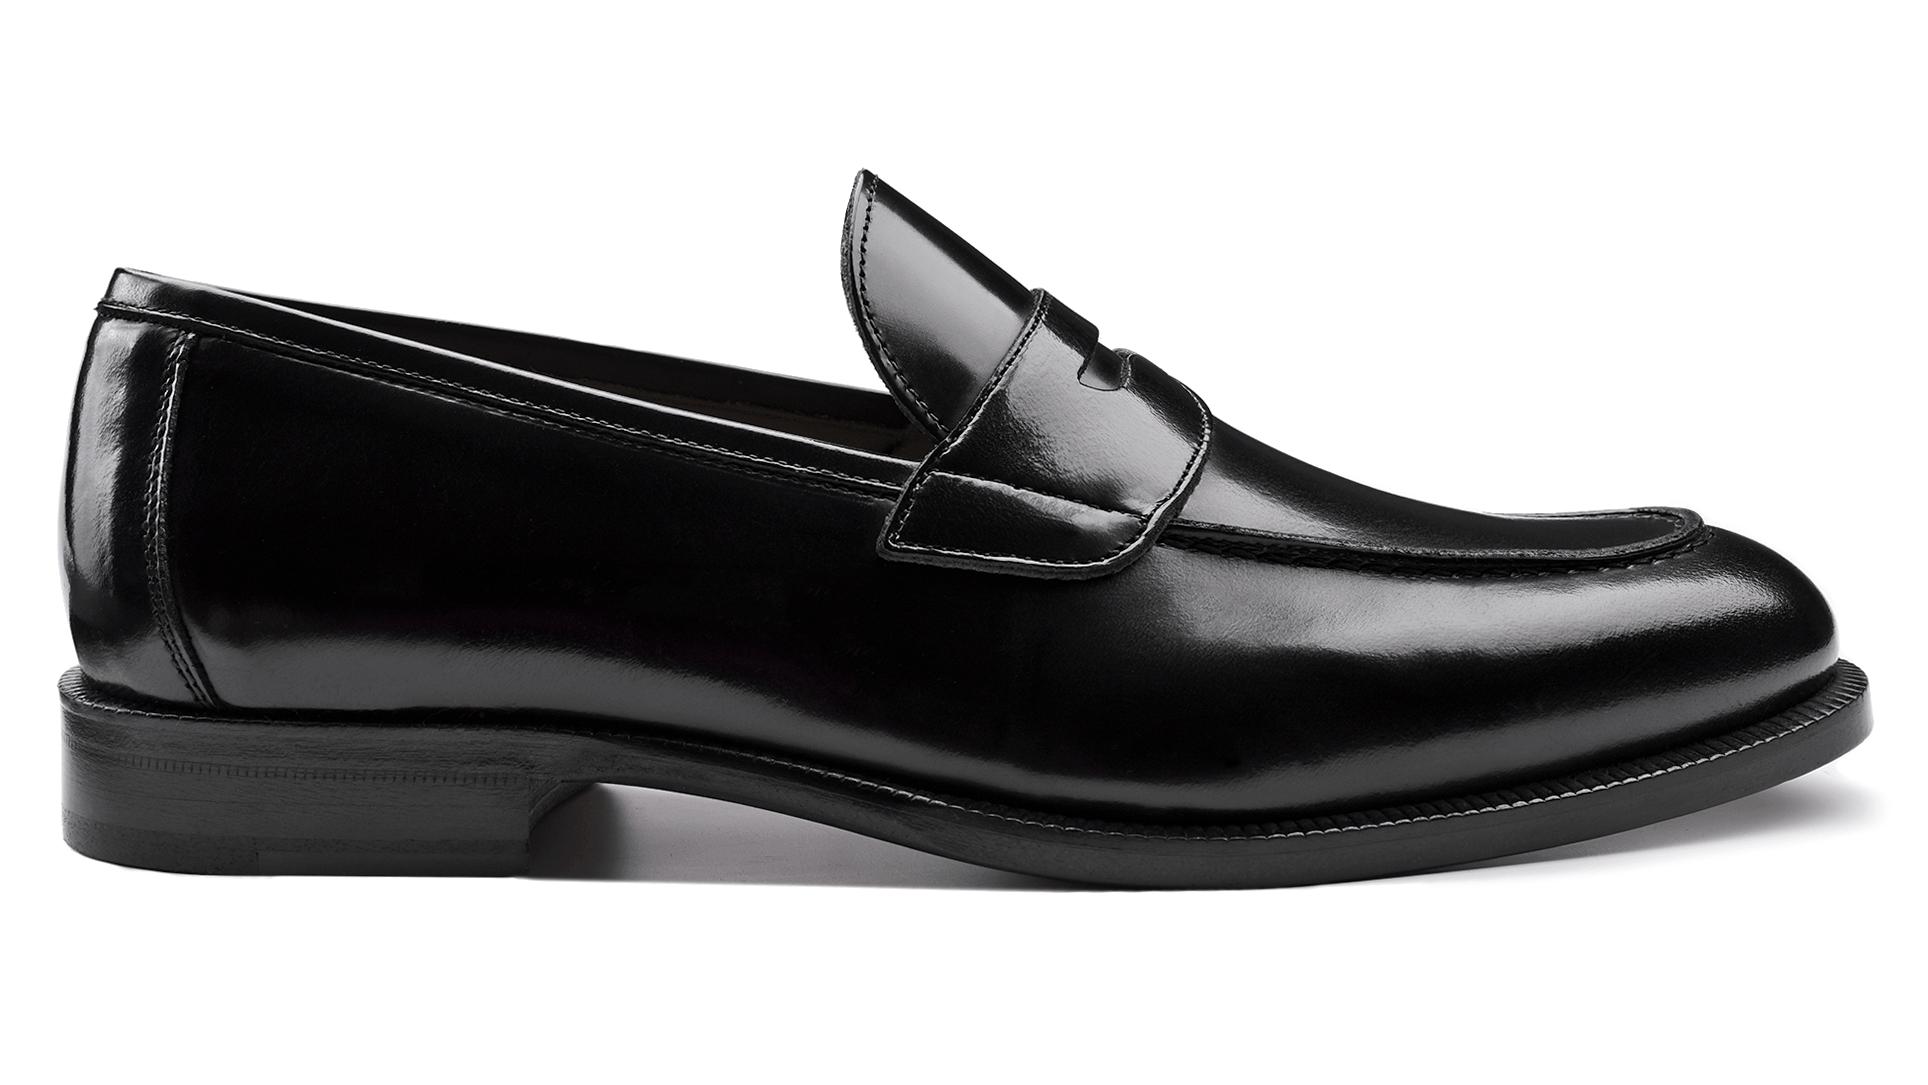 Penny Loafers Polished Black Calfskin